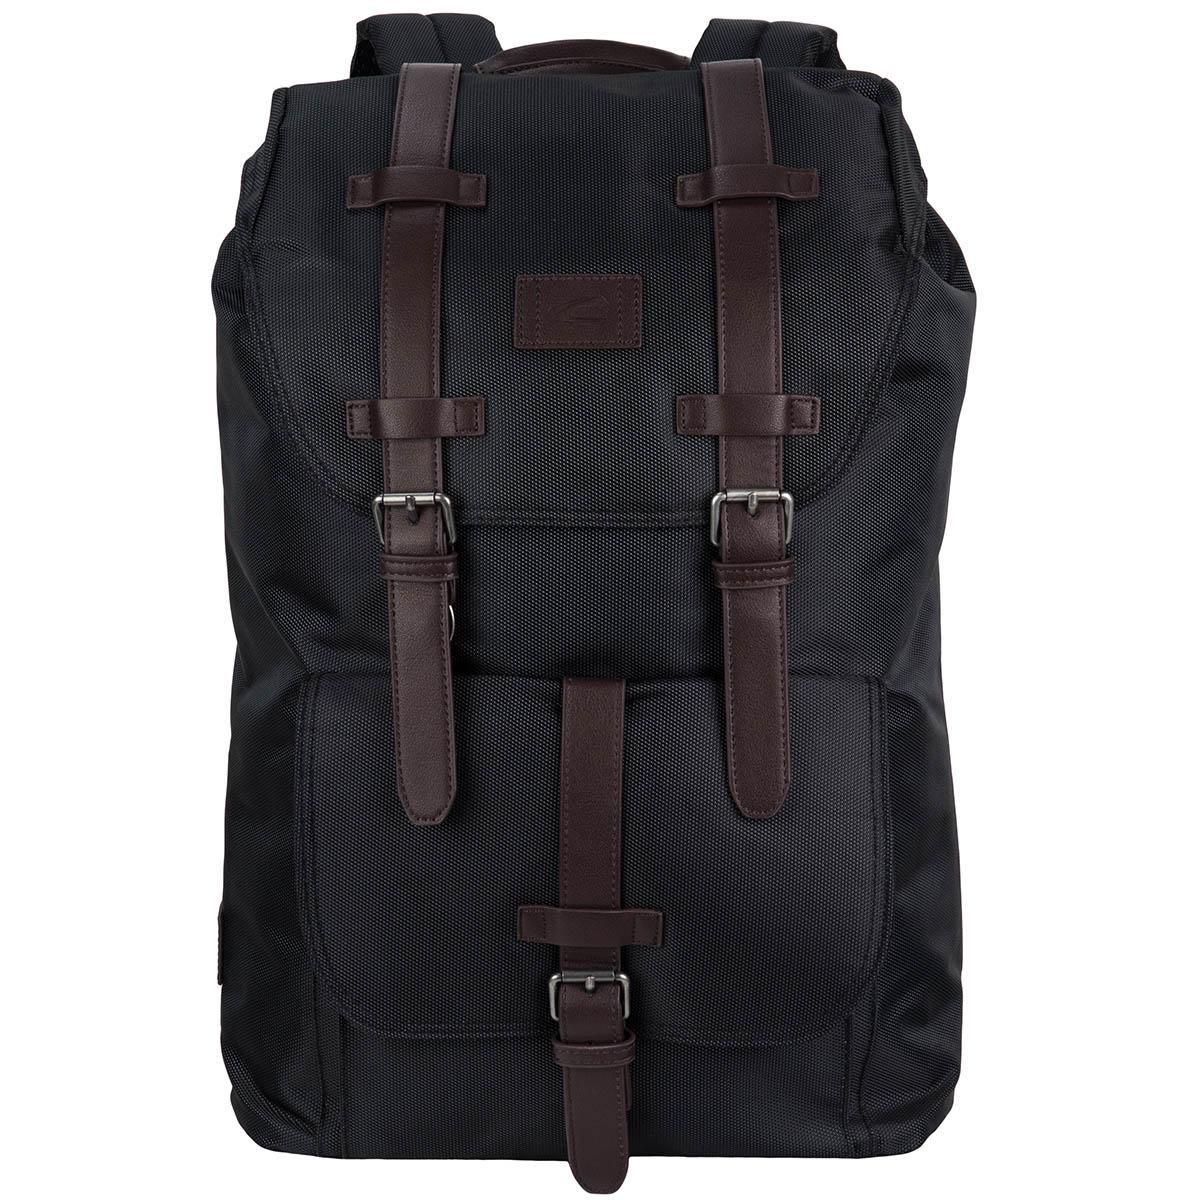 buy popular 16378 fc054 Details zu Camel Active Kurier Rucksack mit Laptopfach Daypack Backpack  Caracas 219-203-60